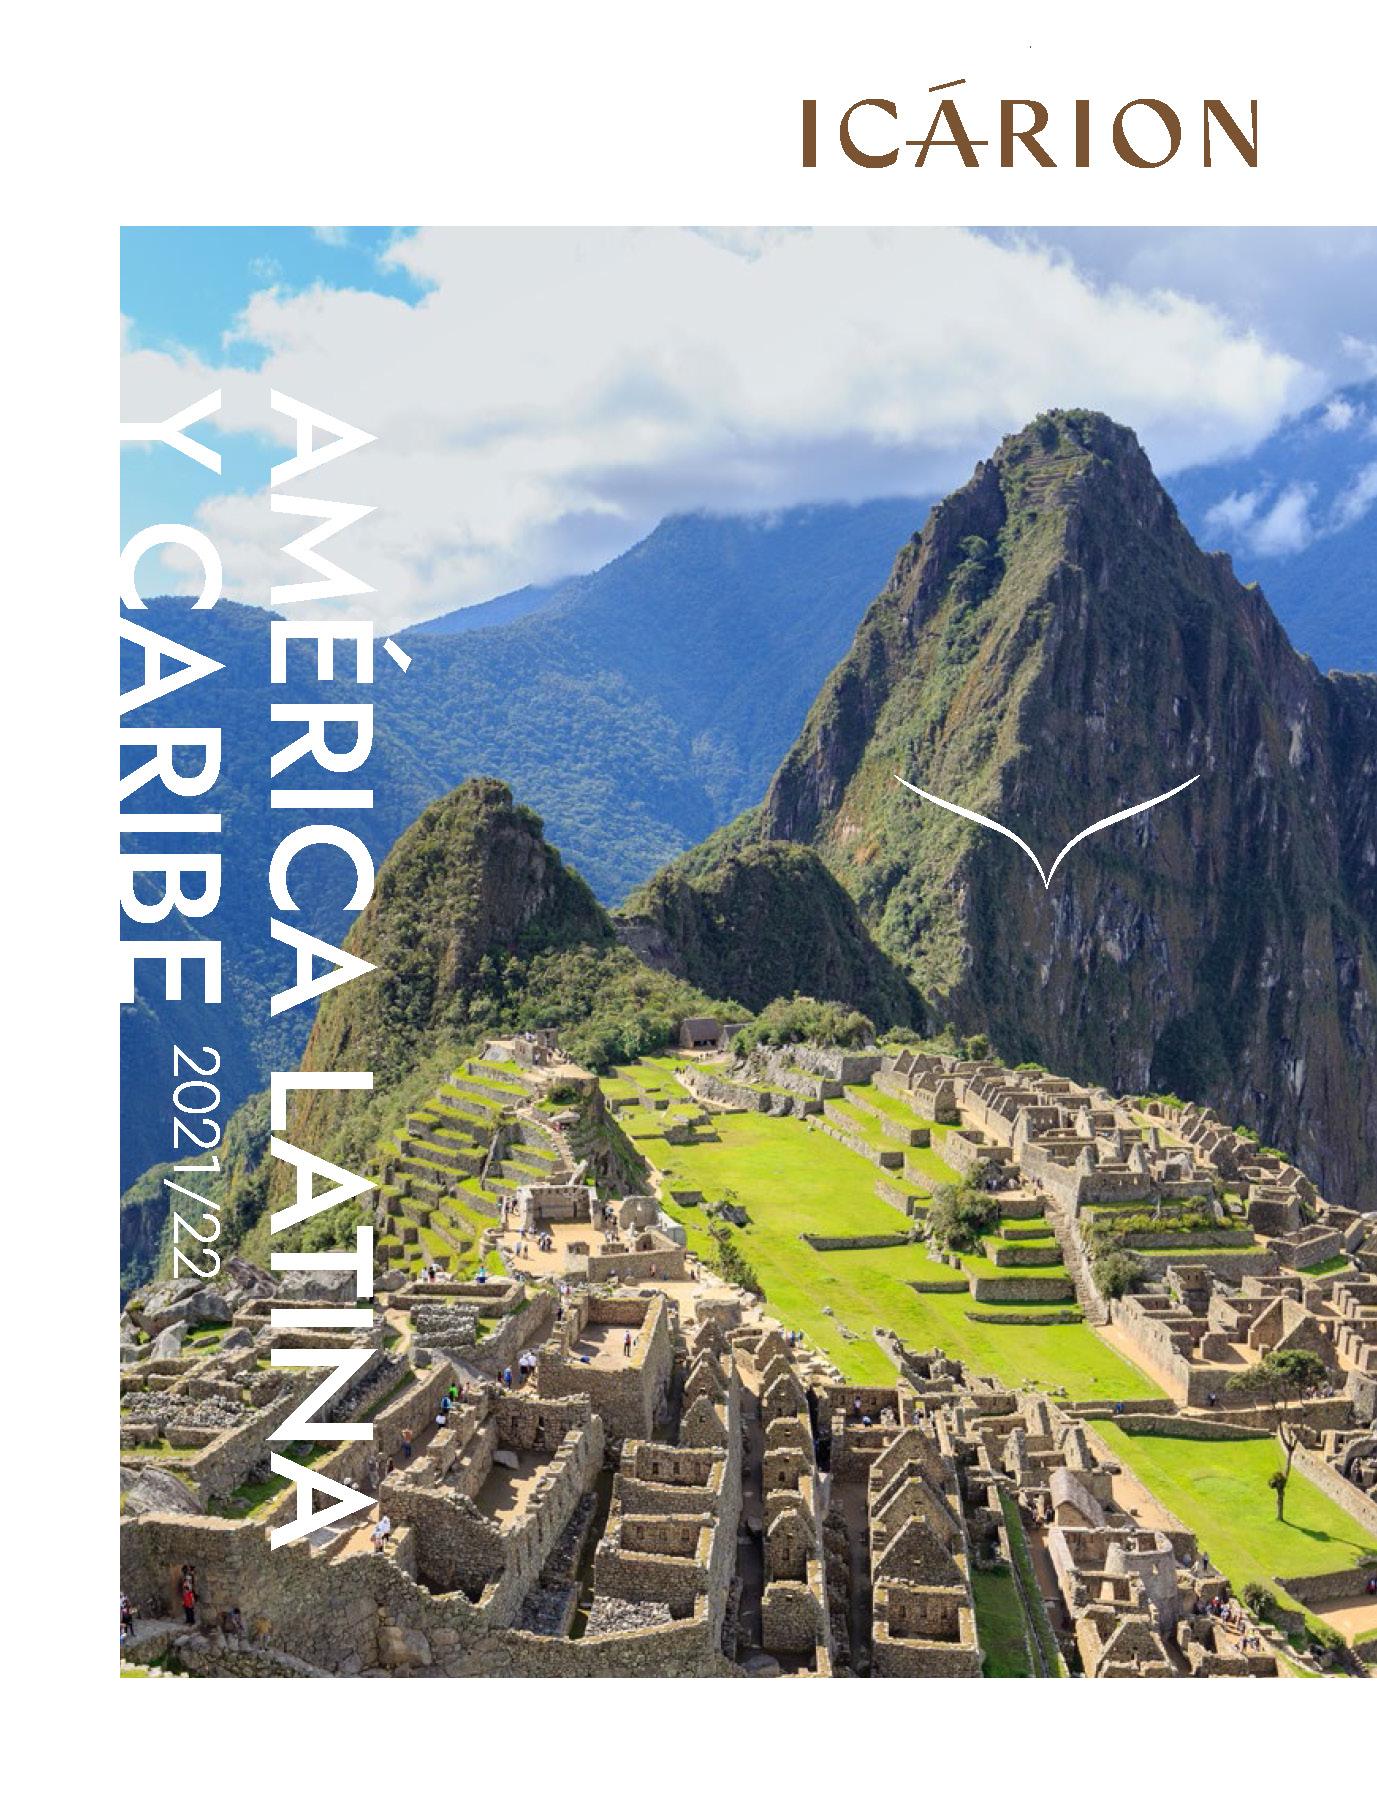 Catalogo Icarion America Latina y Caribe 2021-2022